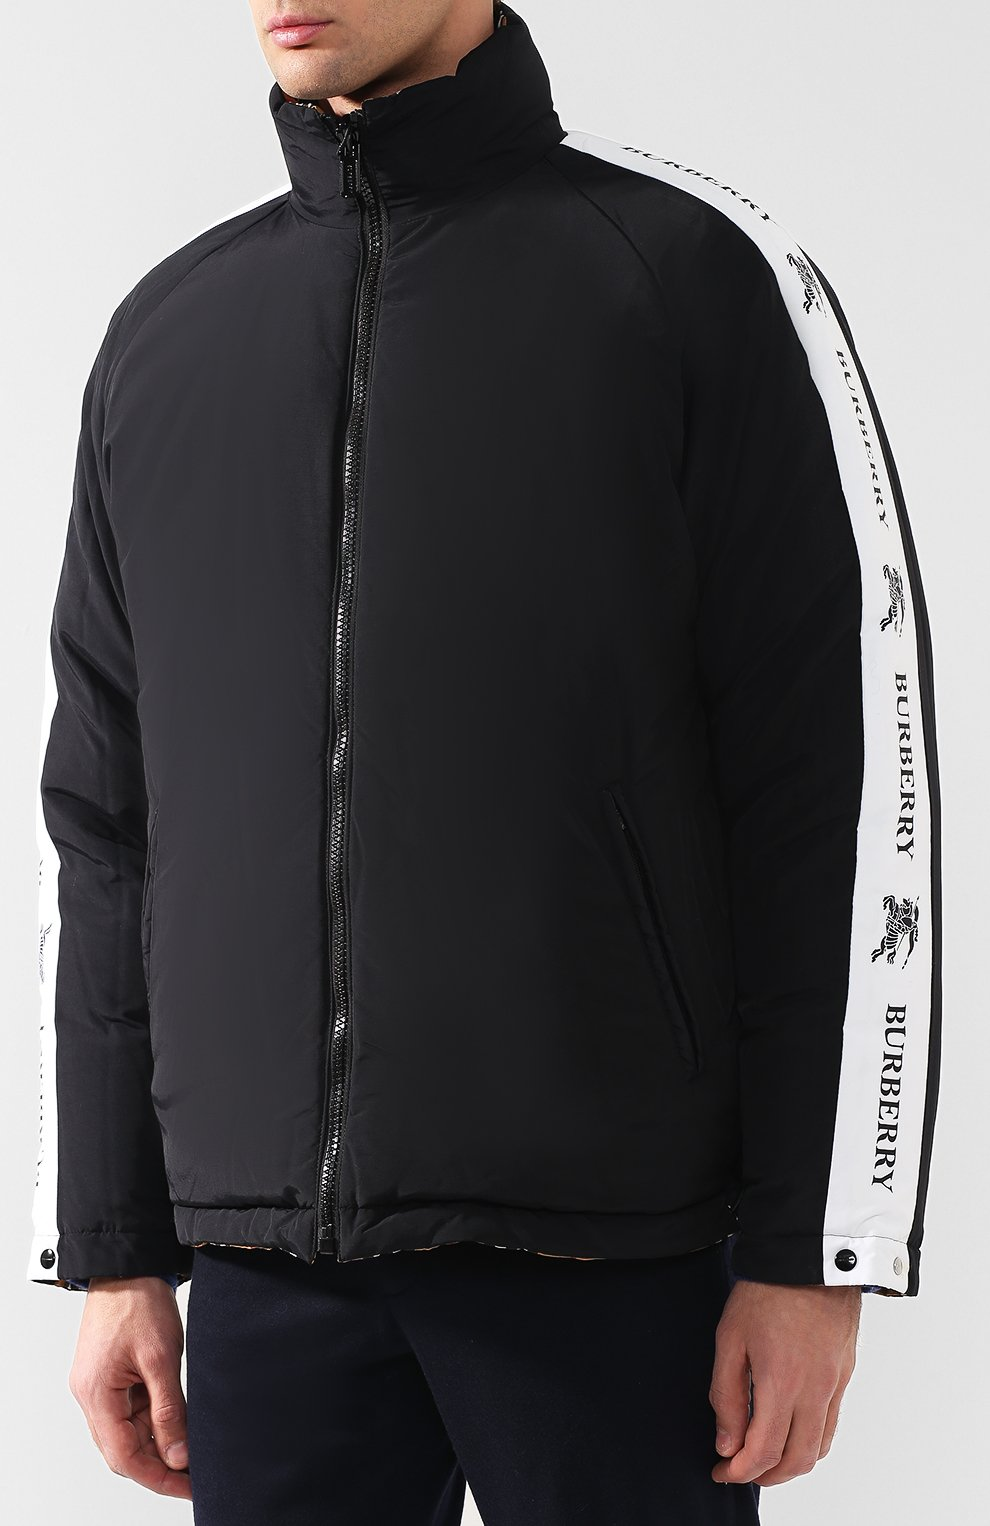 Мужская бежевого двусторонняя пуховая куртка в клетку vintage check ... f52e612dbe6